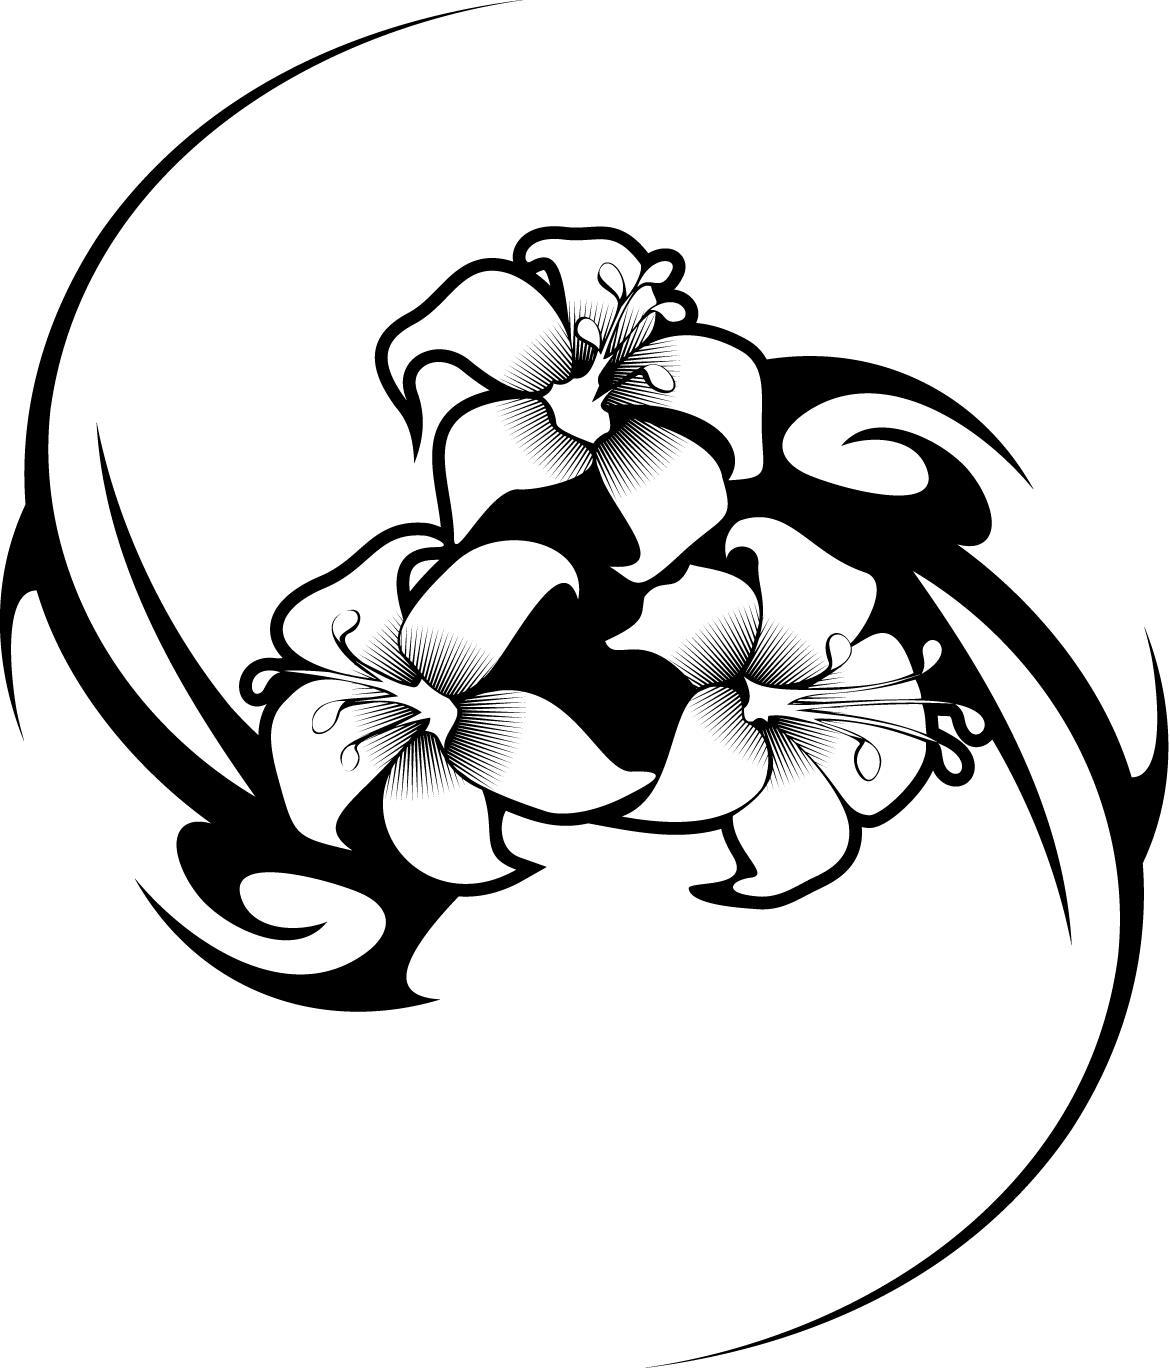 1170x1368 Working Sheet Of A Hibiscus Flower Tattoo Tribal Design